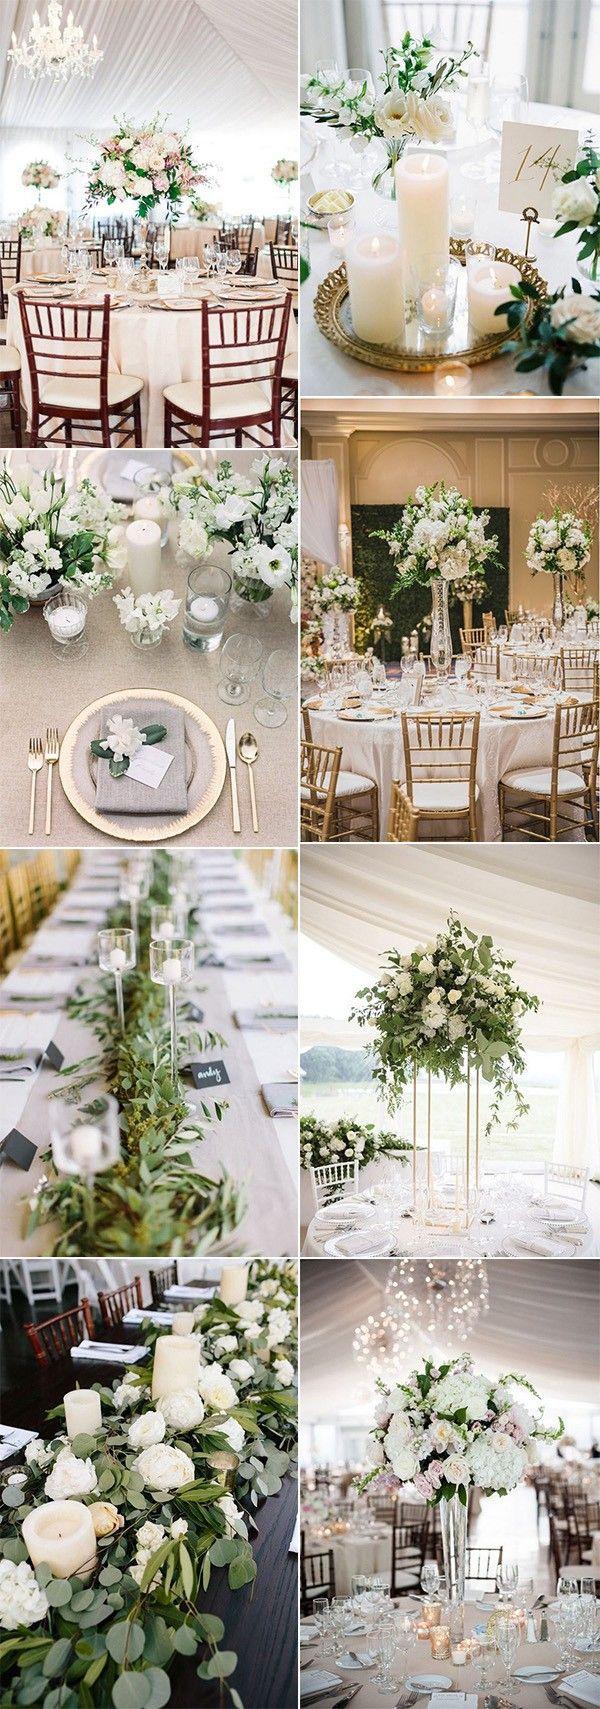 Fall wedding decor 2018   Elegant Wedding Centerpiece Ideas for  Trends  Wedding